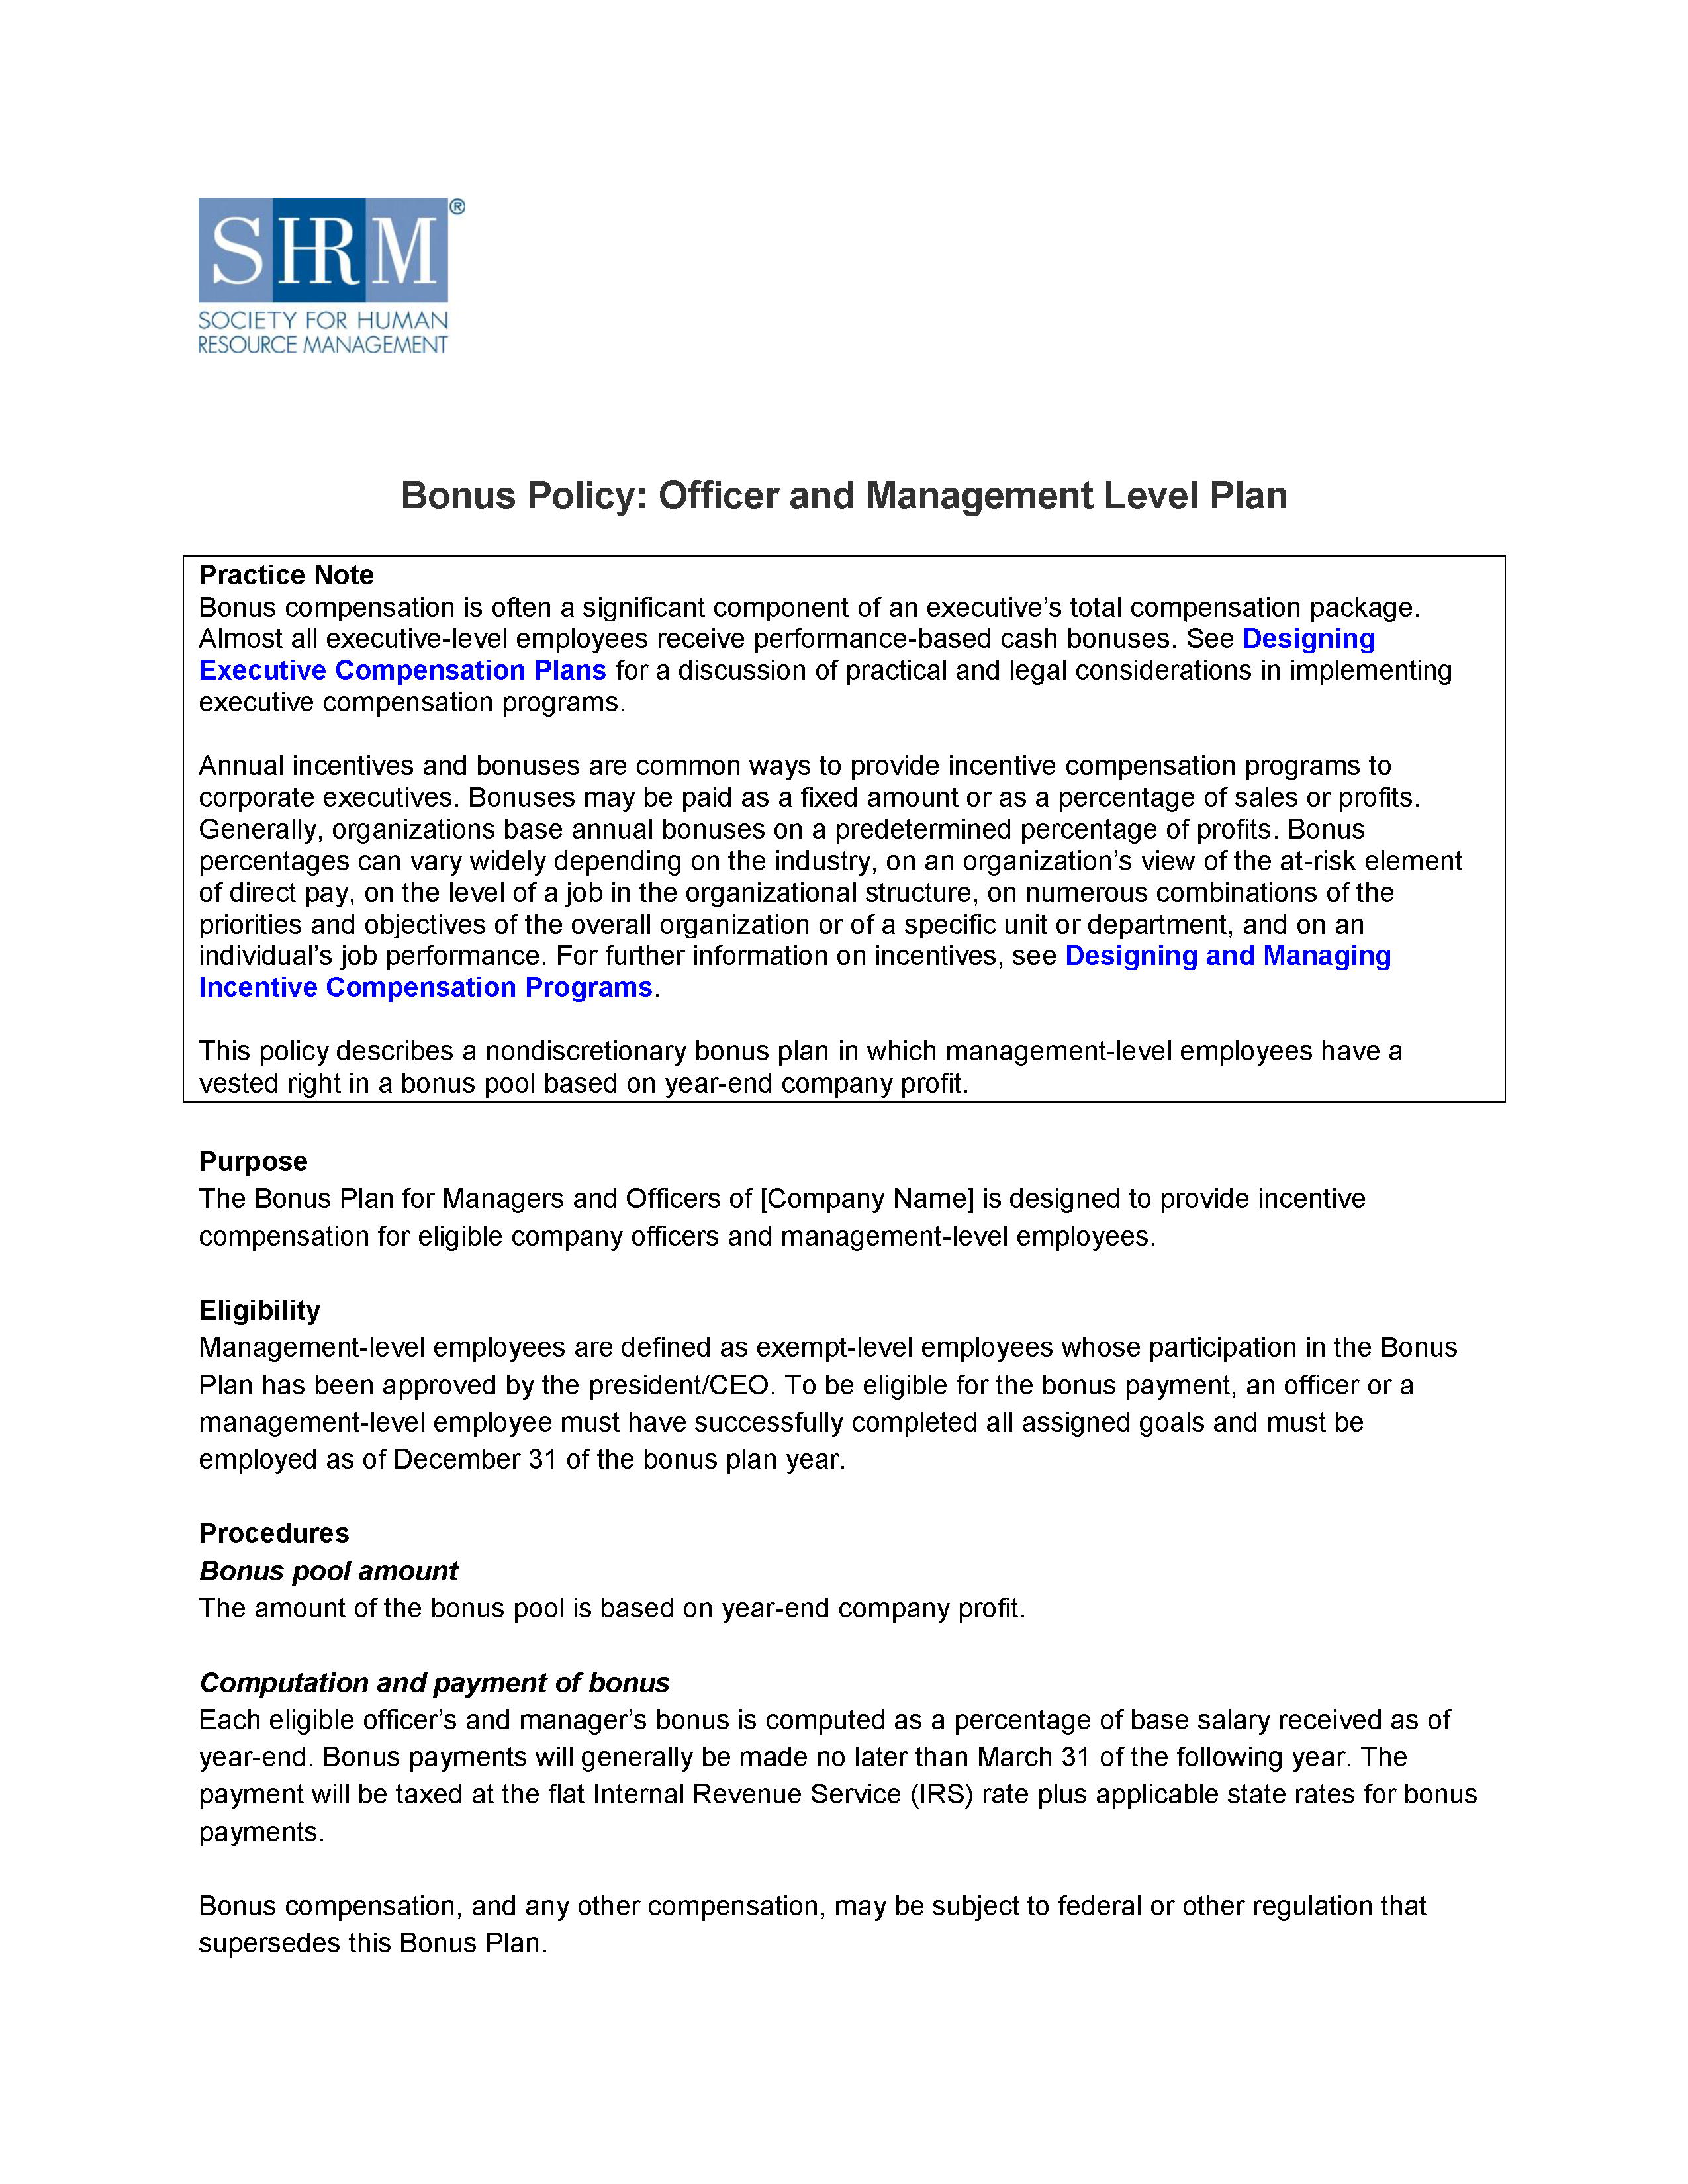 Luxury Incentive Compensation Plan Template Ideas - Professional ...